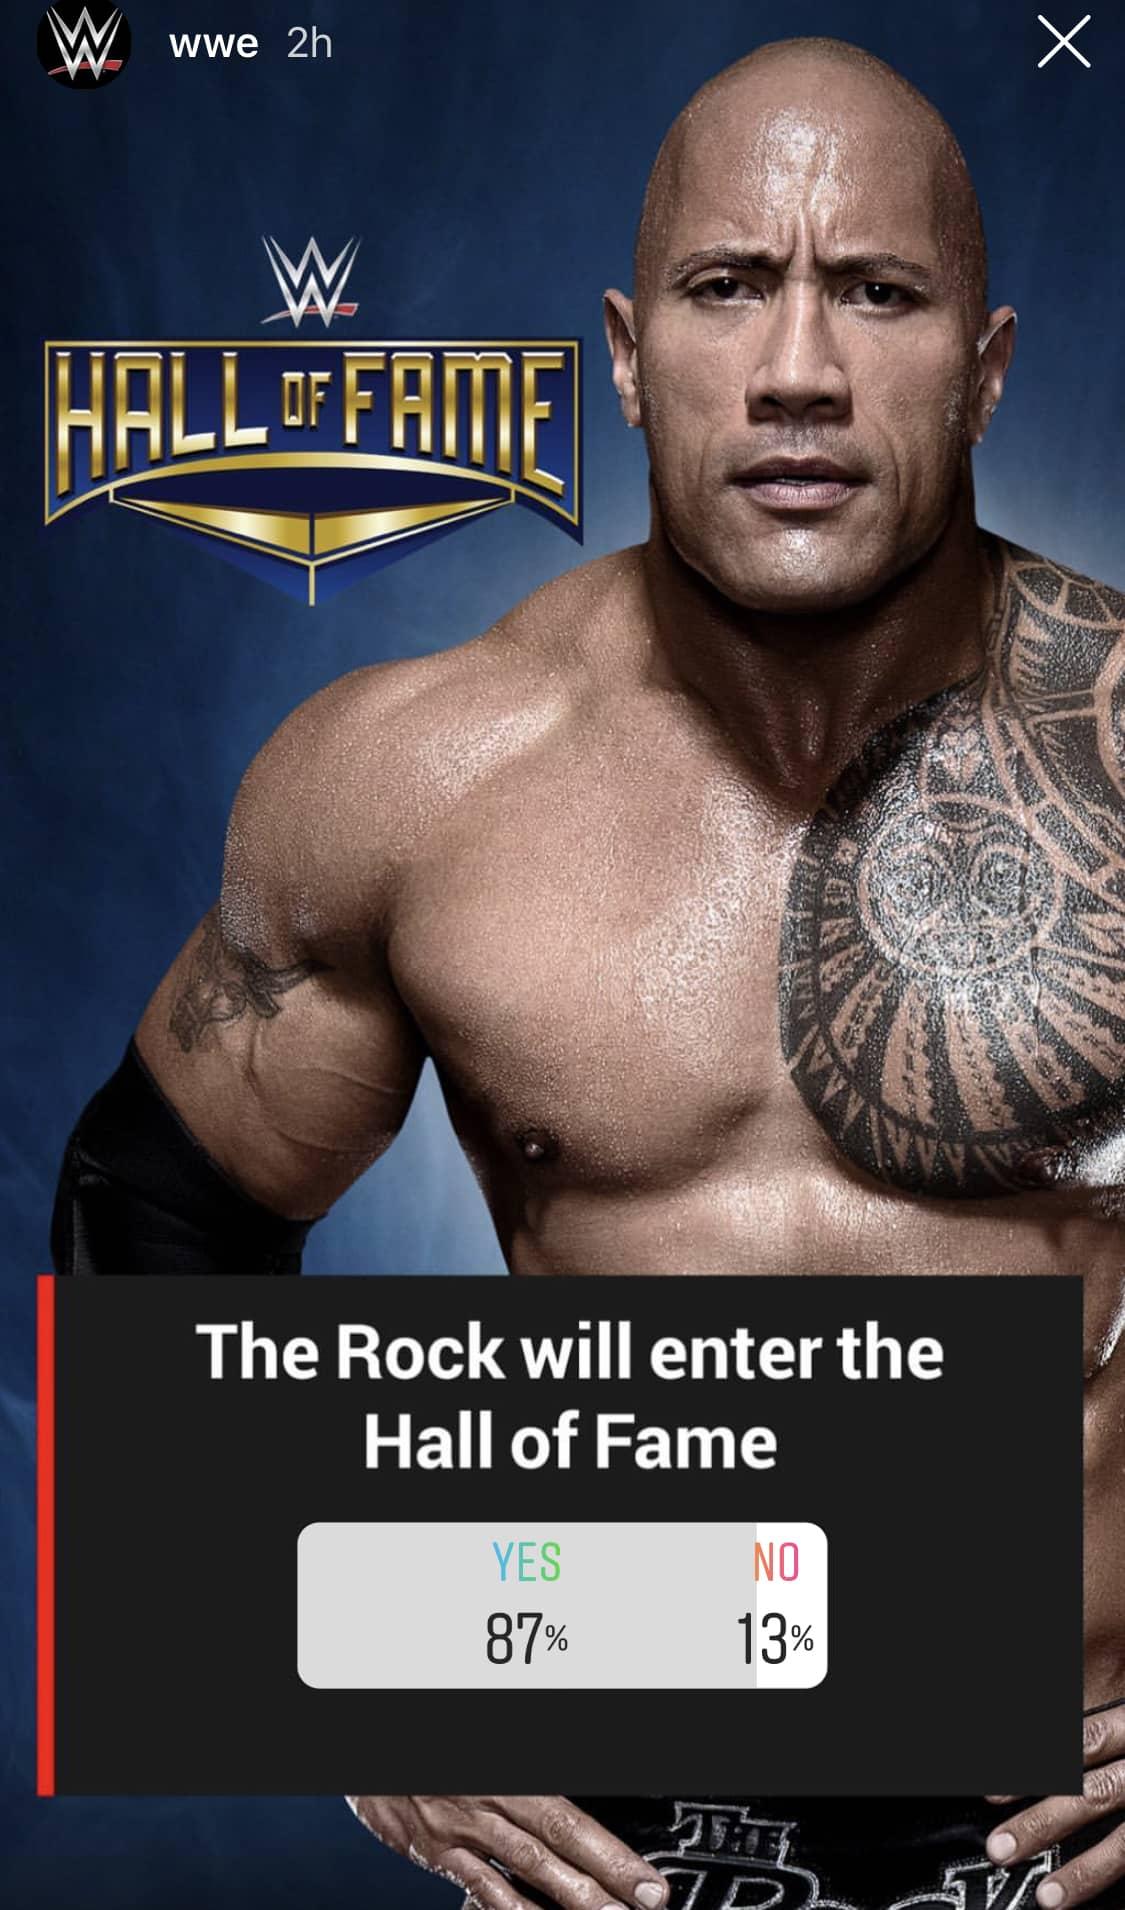 WWE insinúa la inducción de The Rock al WWE Hall of Fame 2019 / Instagram.com/WWE